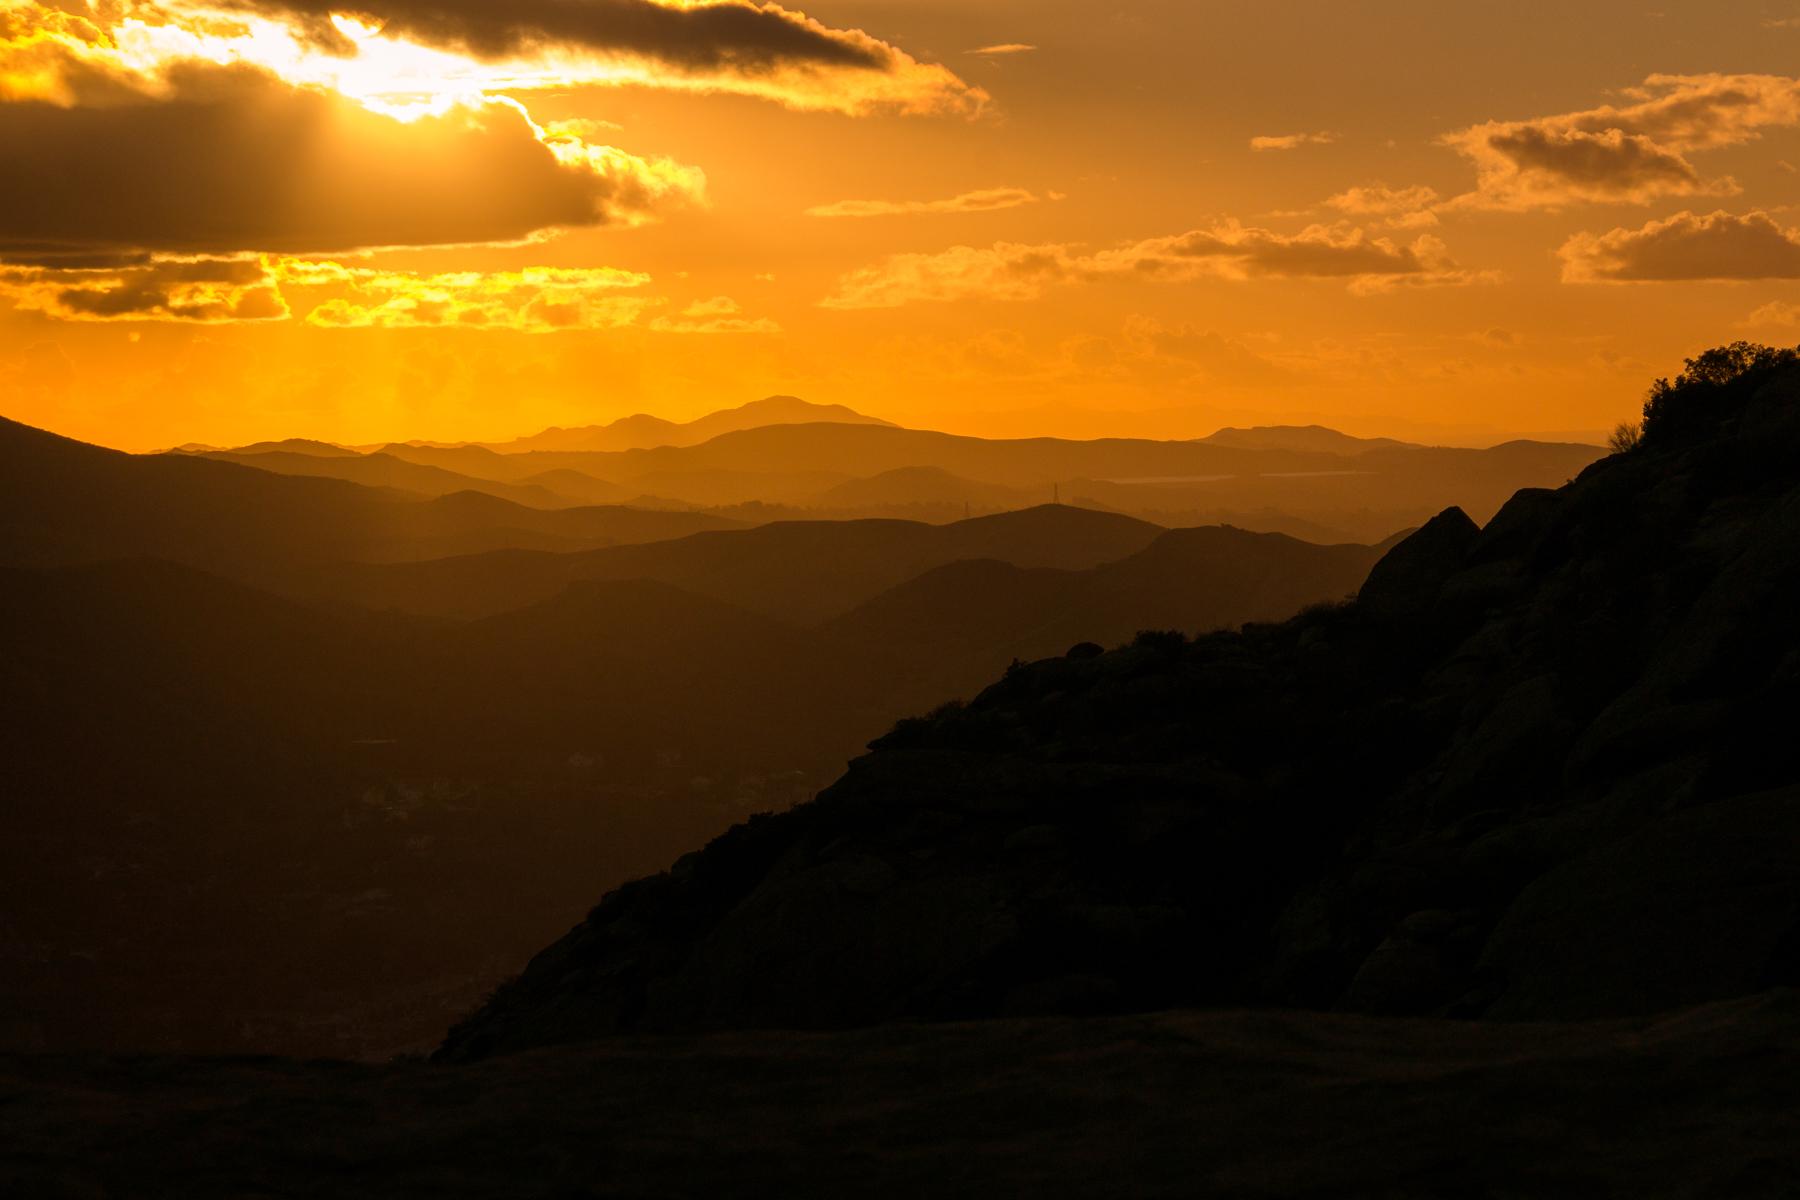 Wasim Muklashy Photography_110114_Samsung NX30_Rocky Peak Park_Simi Valley_California_The Arcanum_Silence